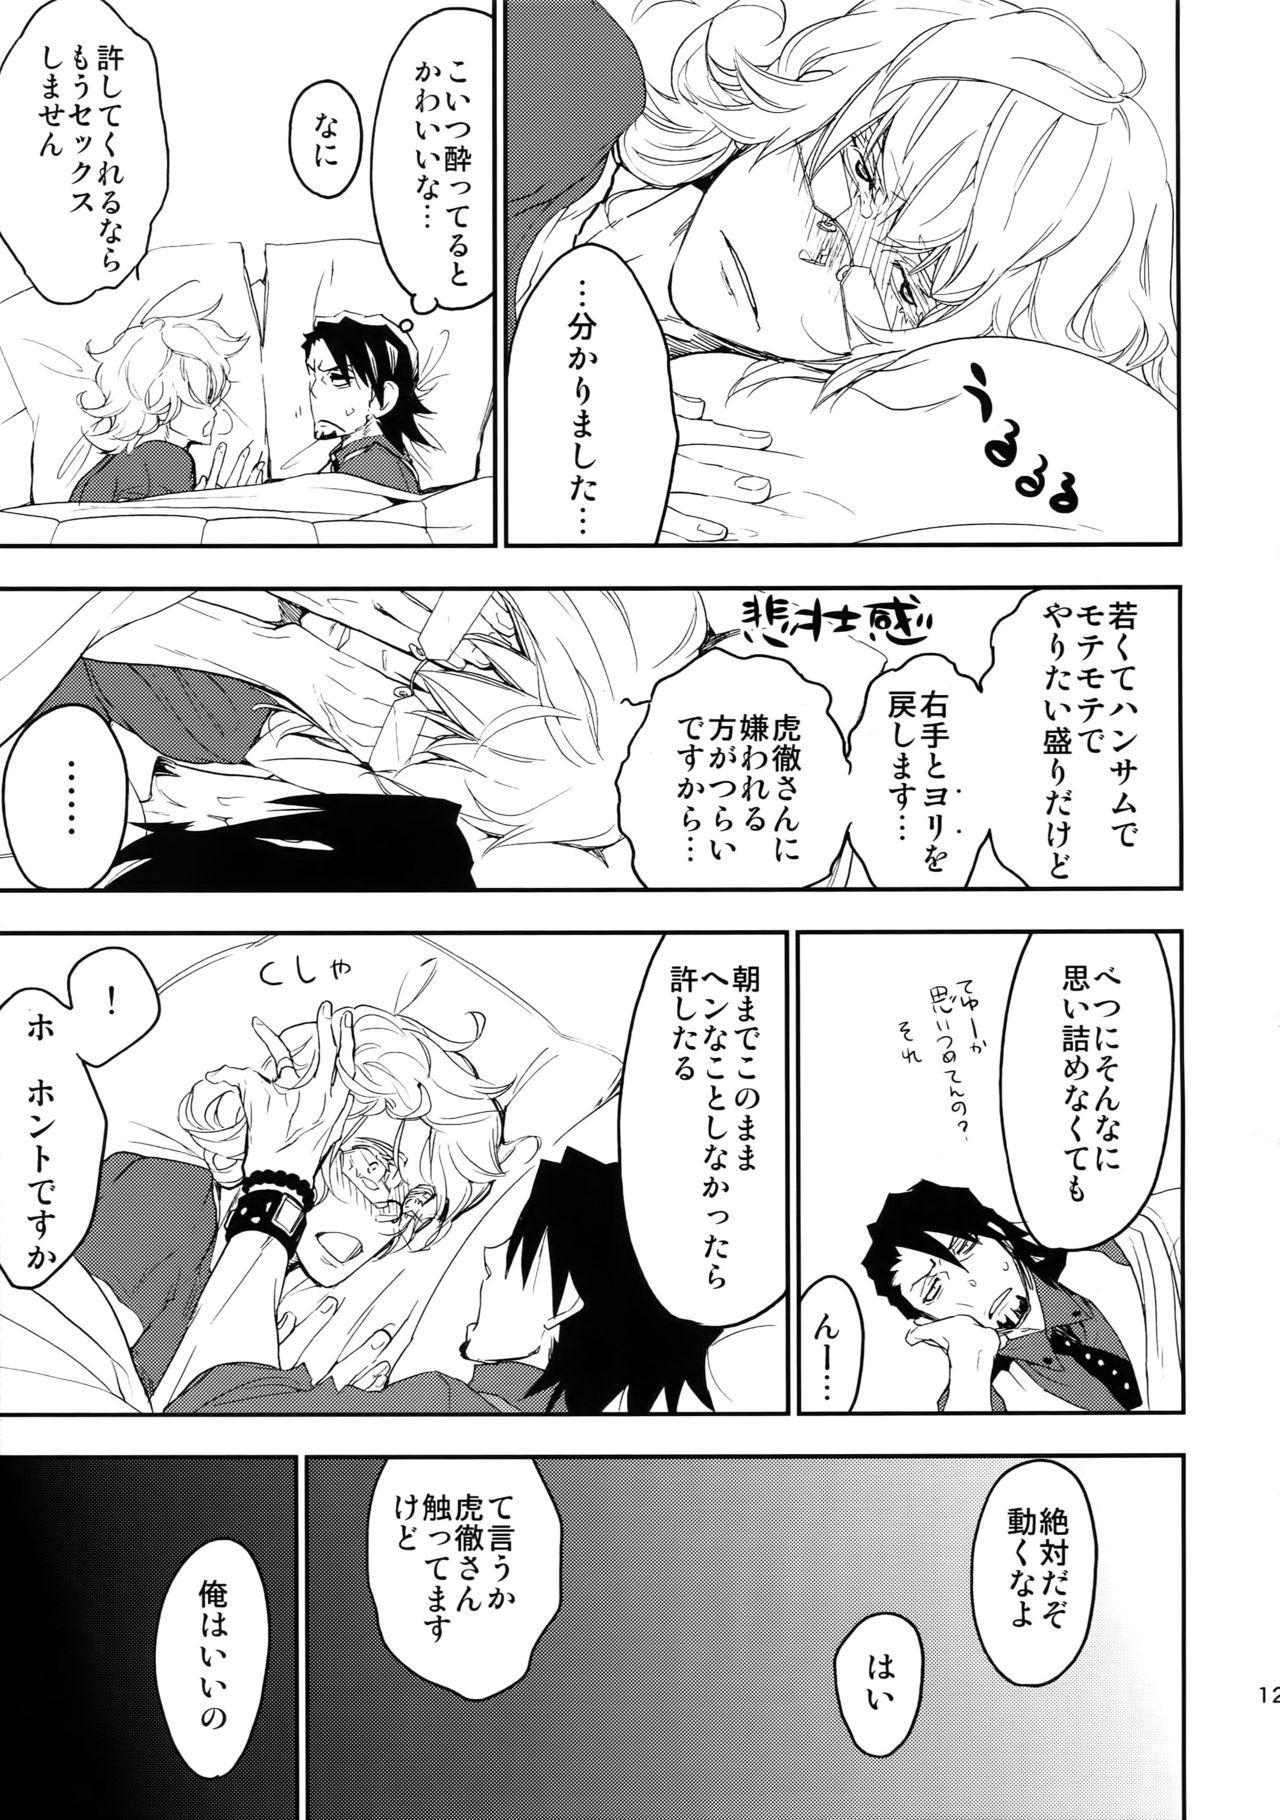 T&B Sairoku! 127